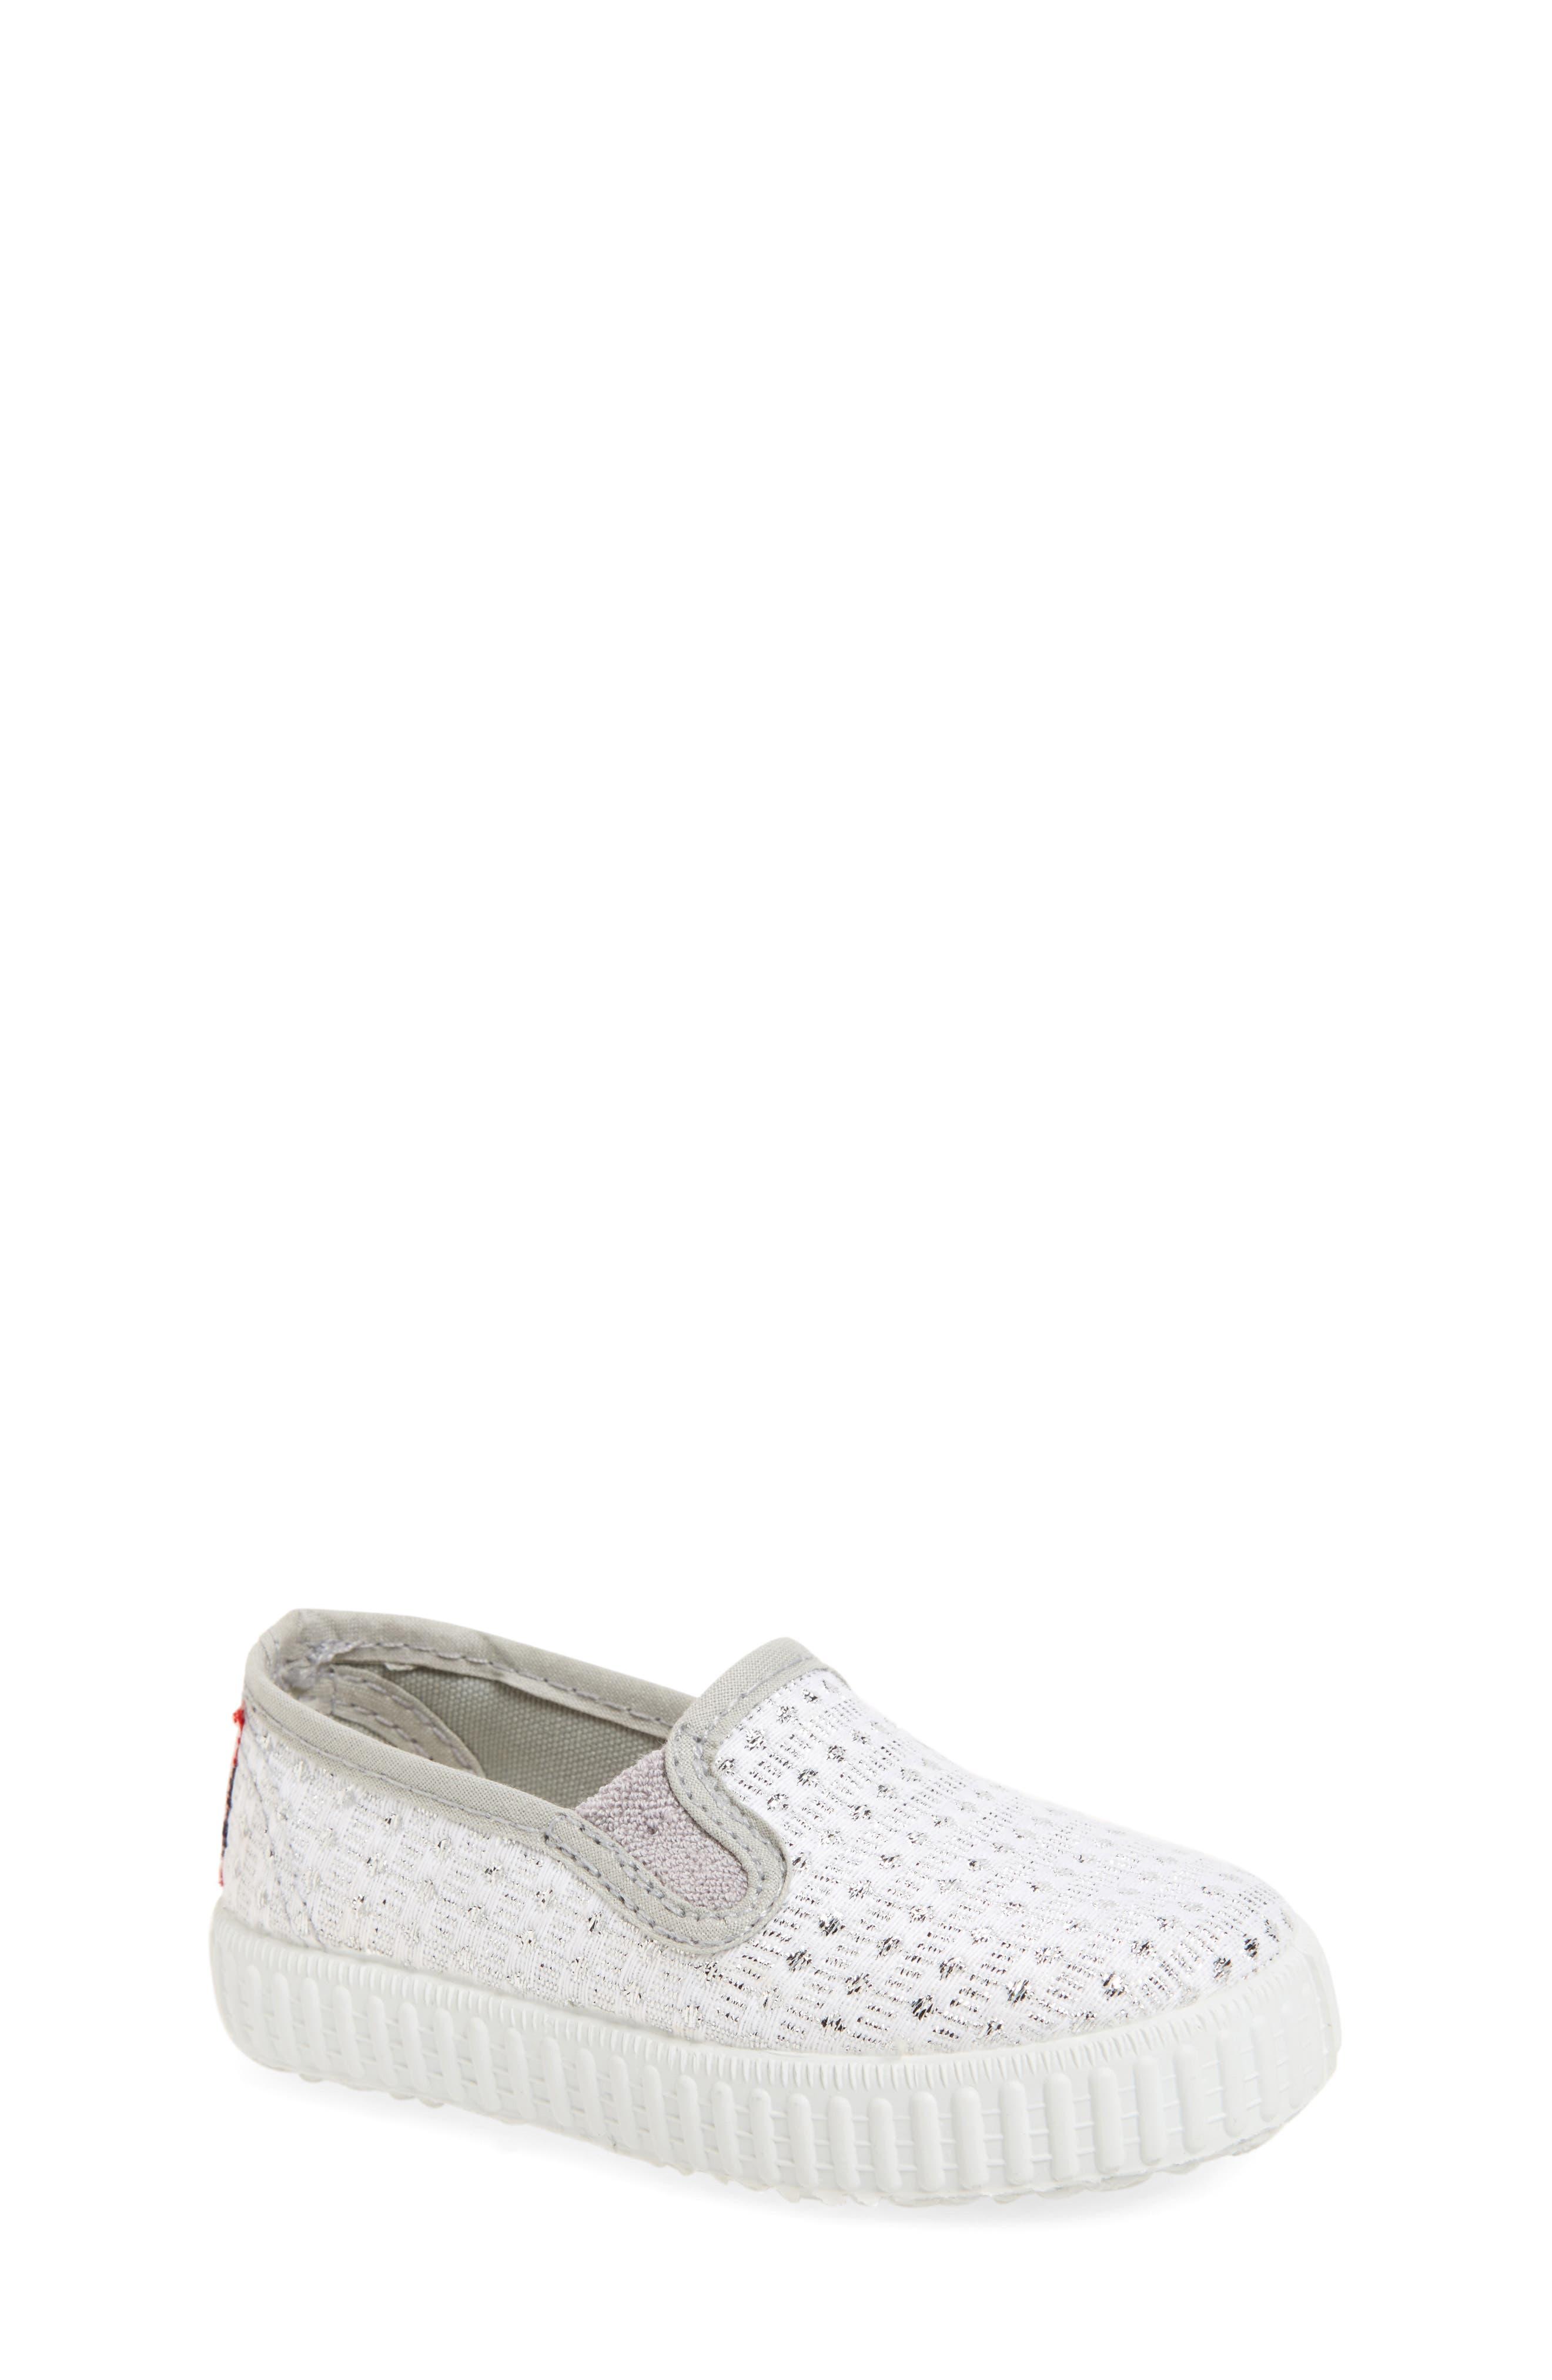 Cienta Slip-On Sneaker (Walker & Toddler)